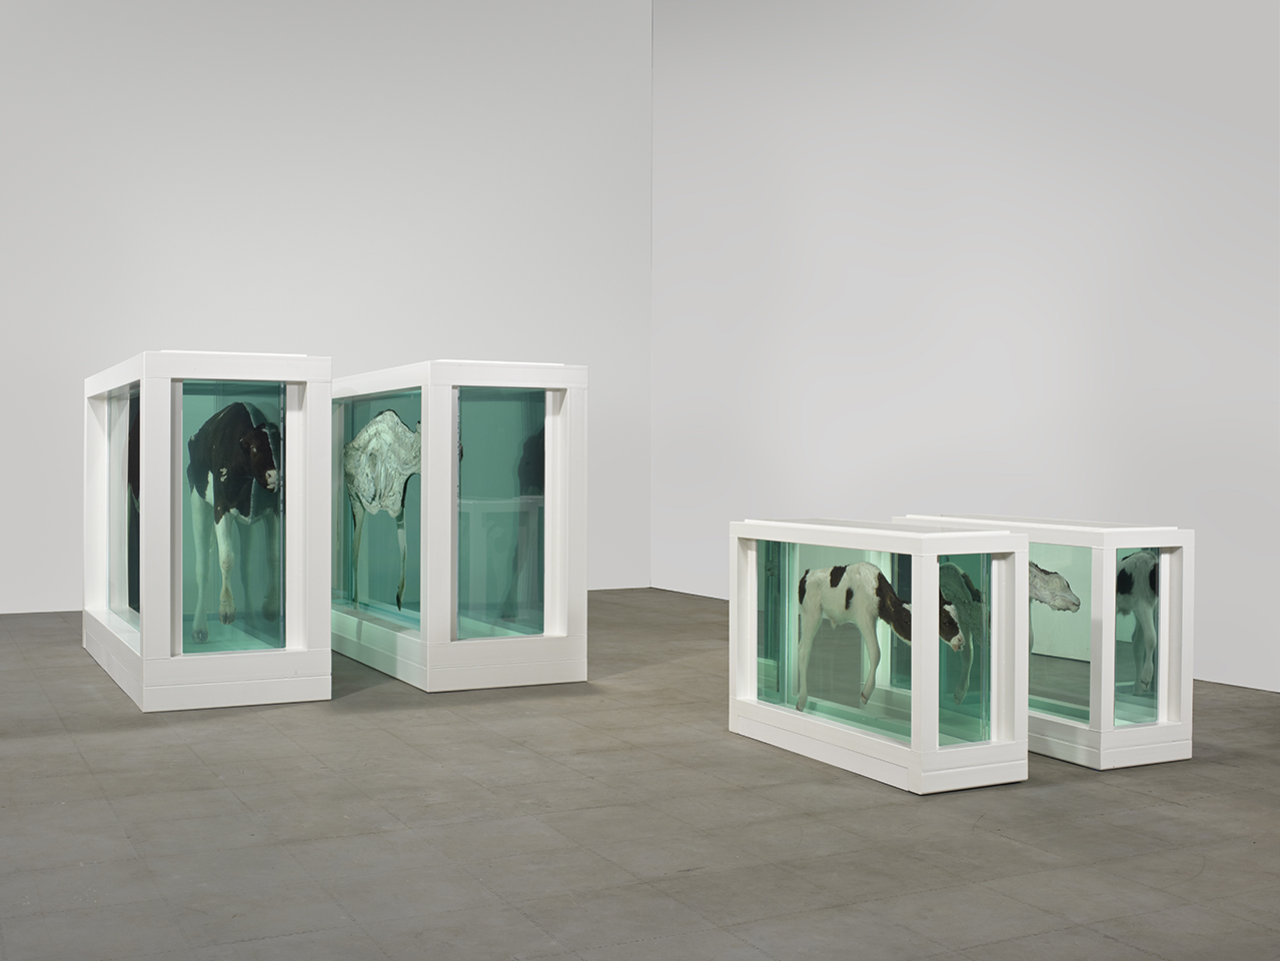 Damien Hirst Mother and Child (Divided), Turner prize 1995